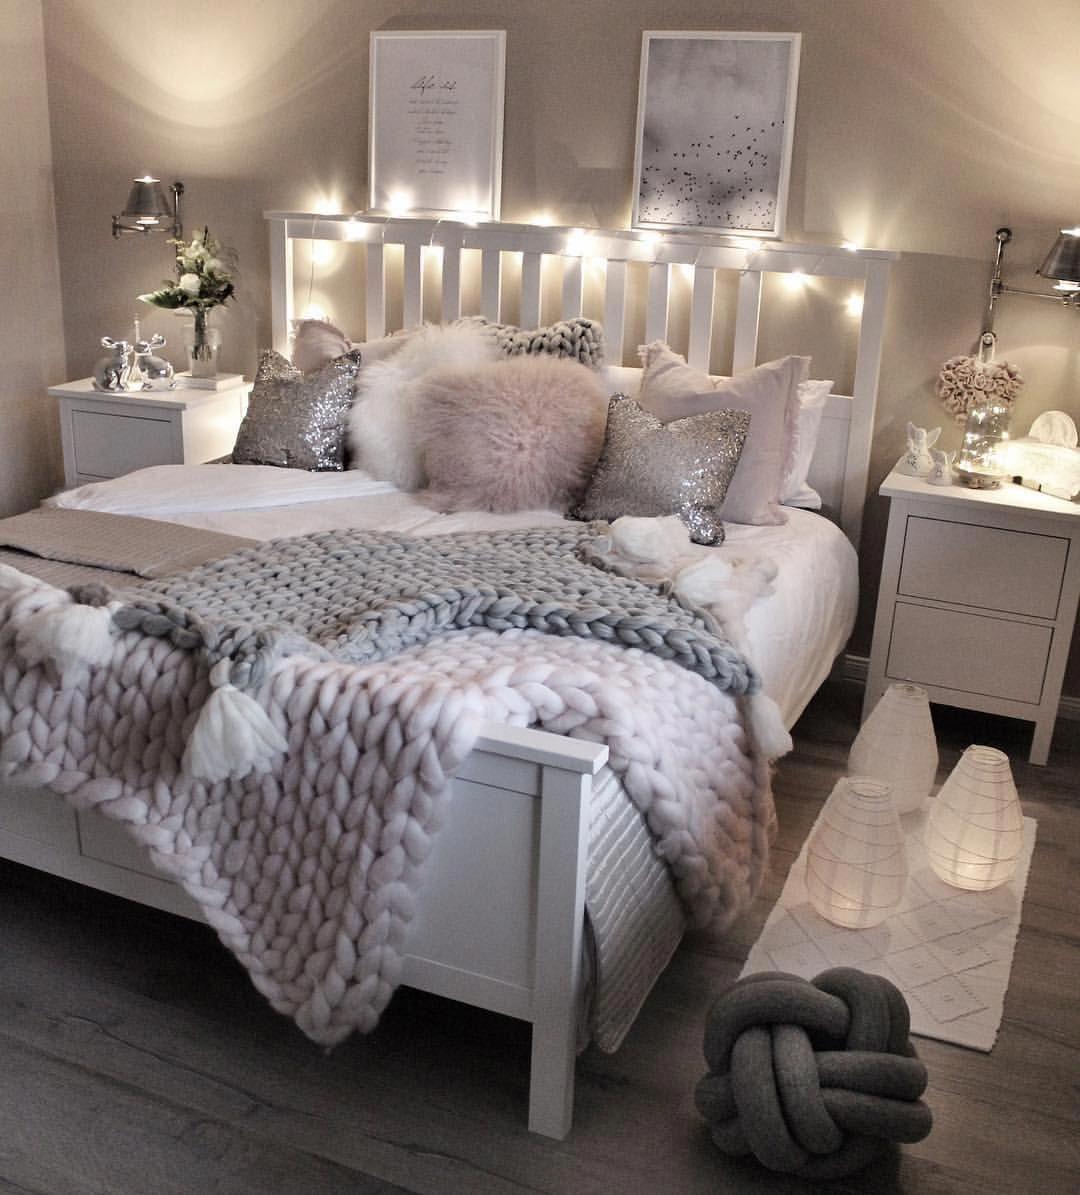 Teenage bedrooms #Shabbychicbedrooms | Small bedroom ...